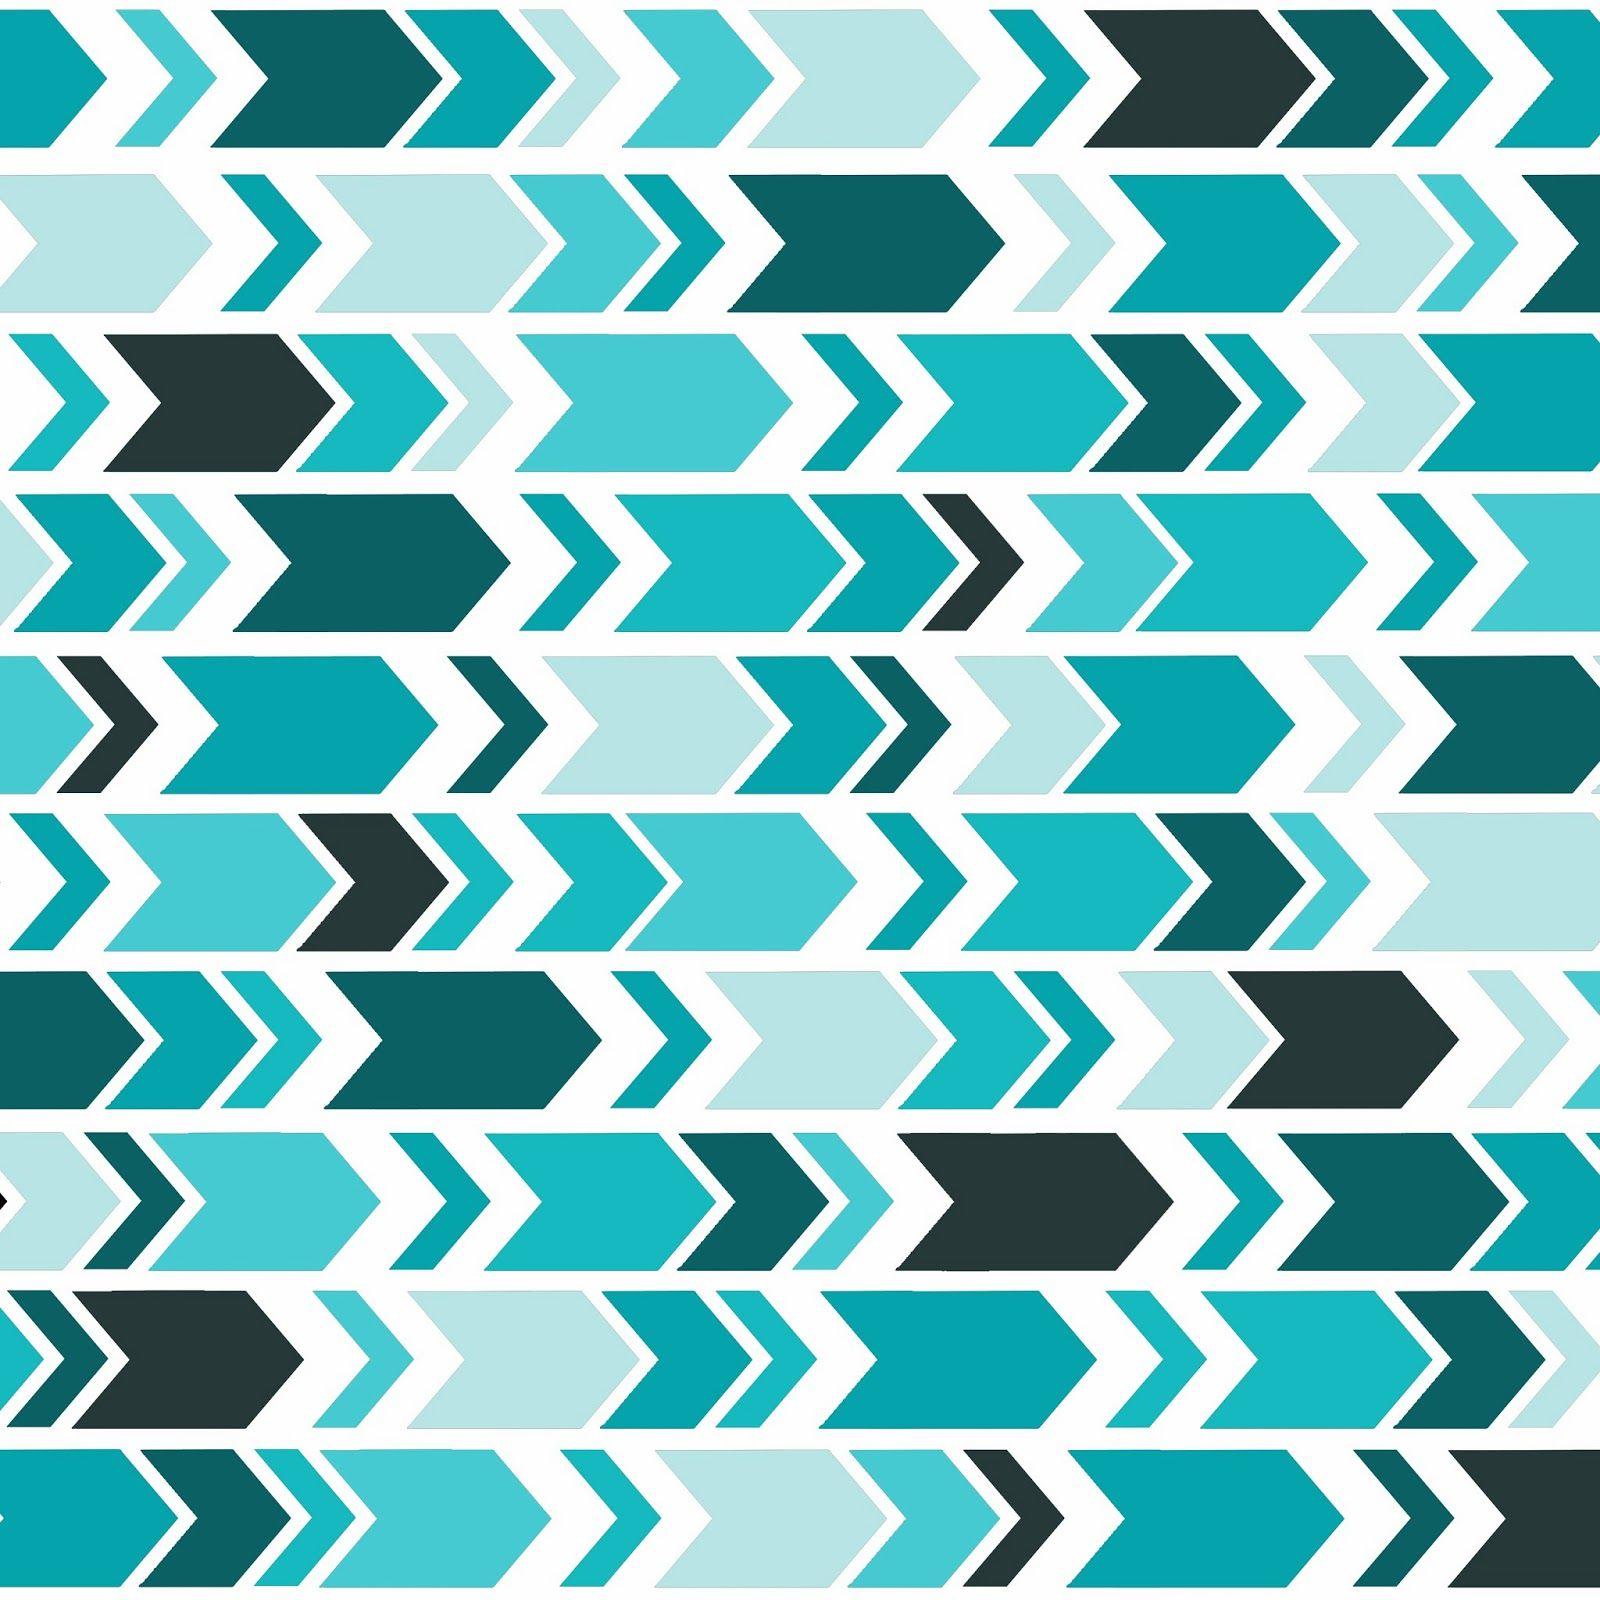 Arrowhead Chevron Printable FREEBIES Patterns! | Chevron ...